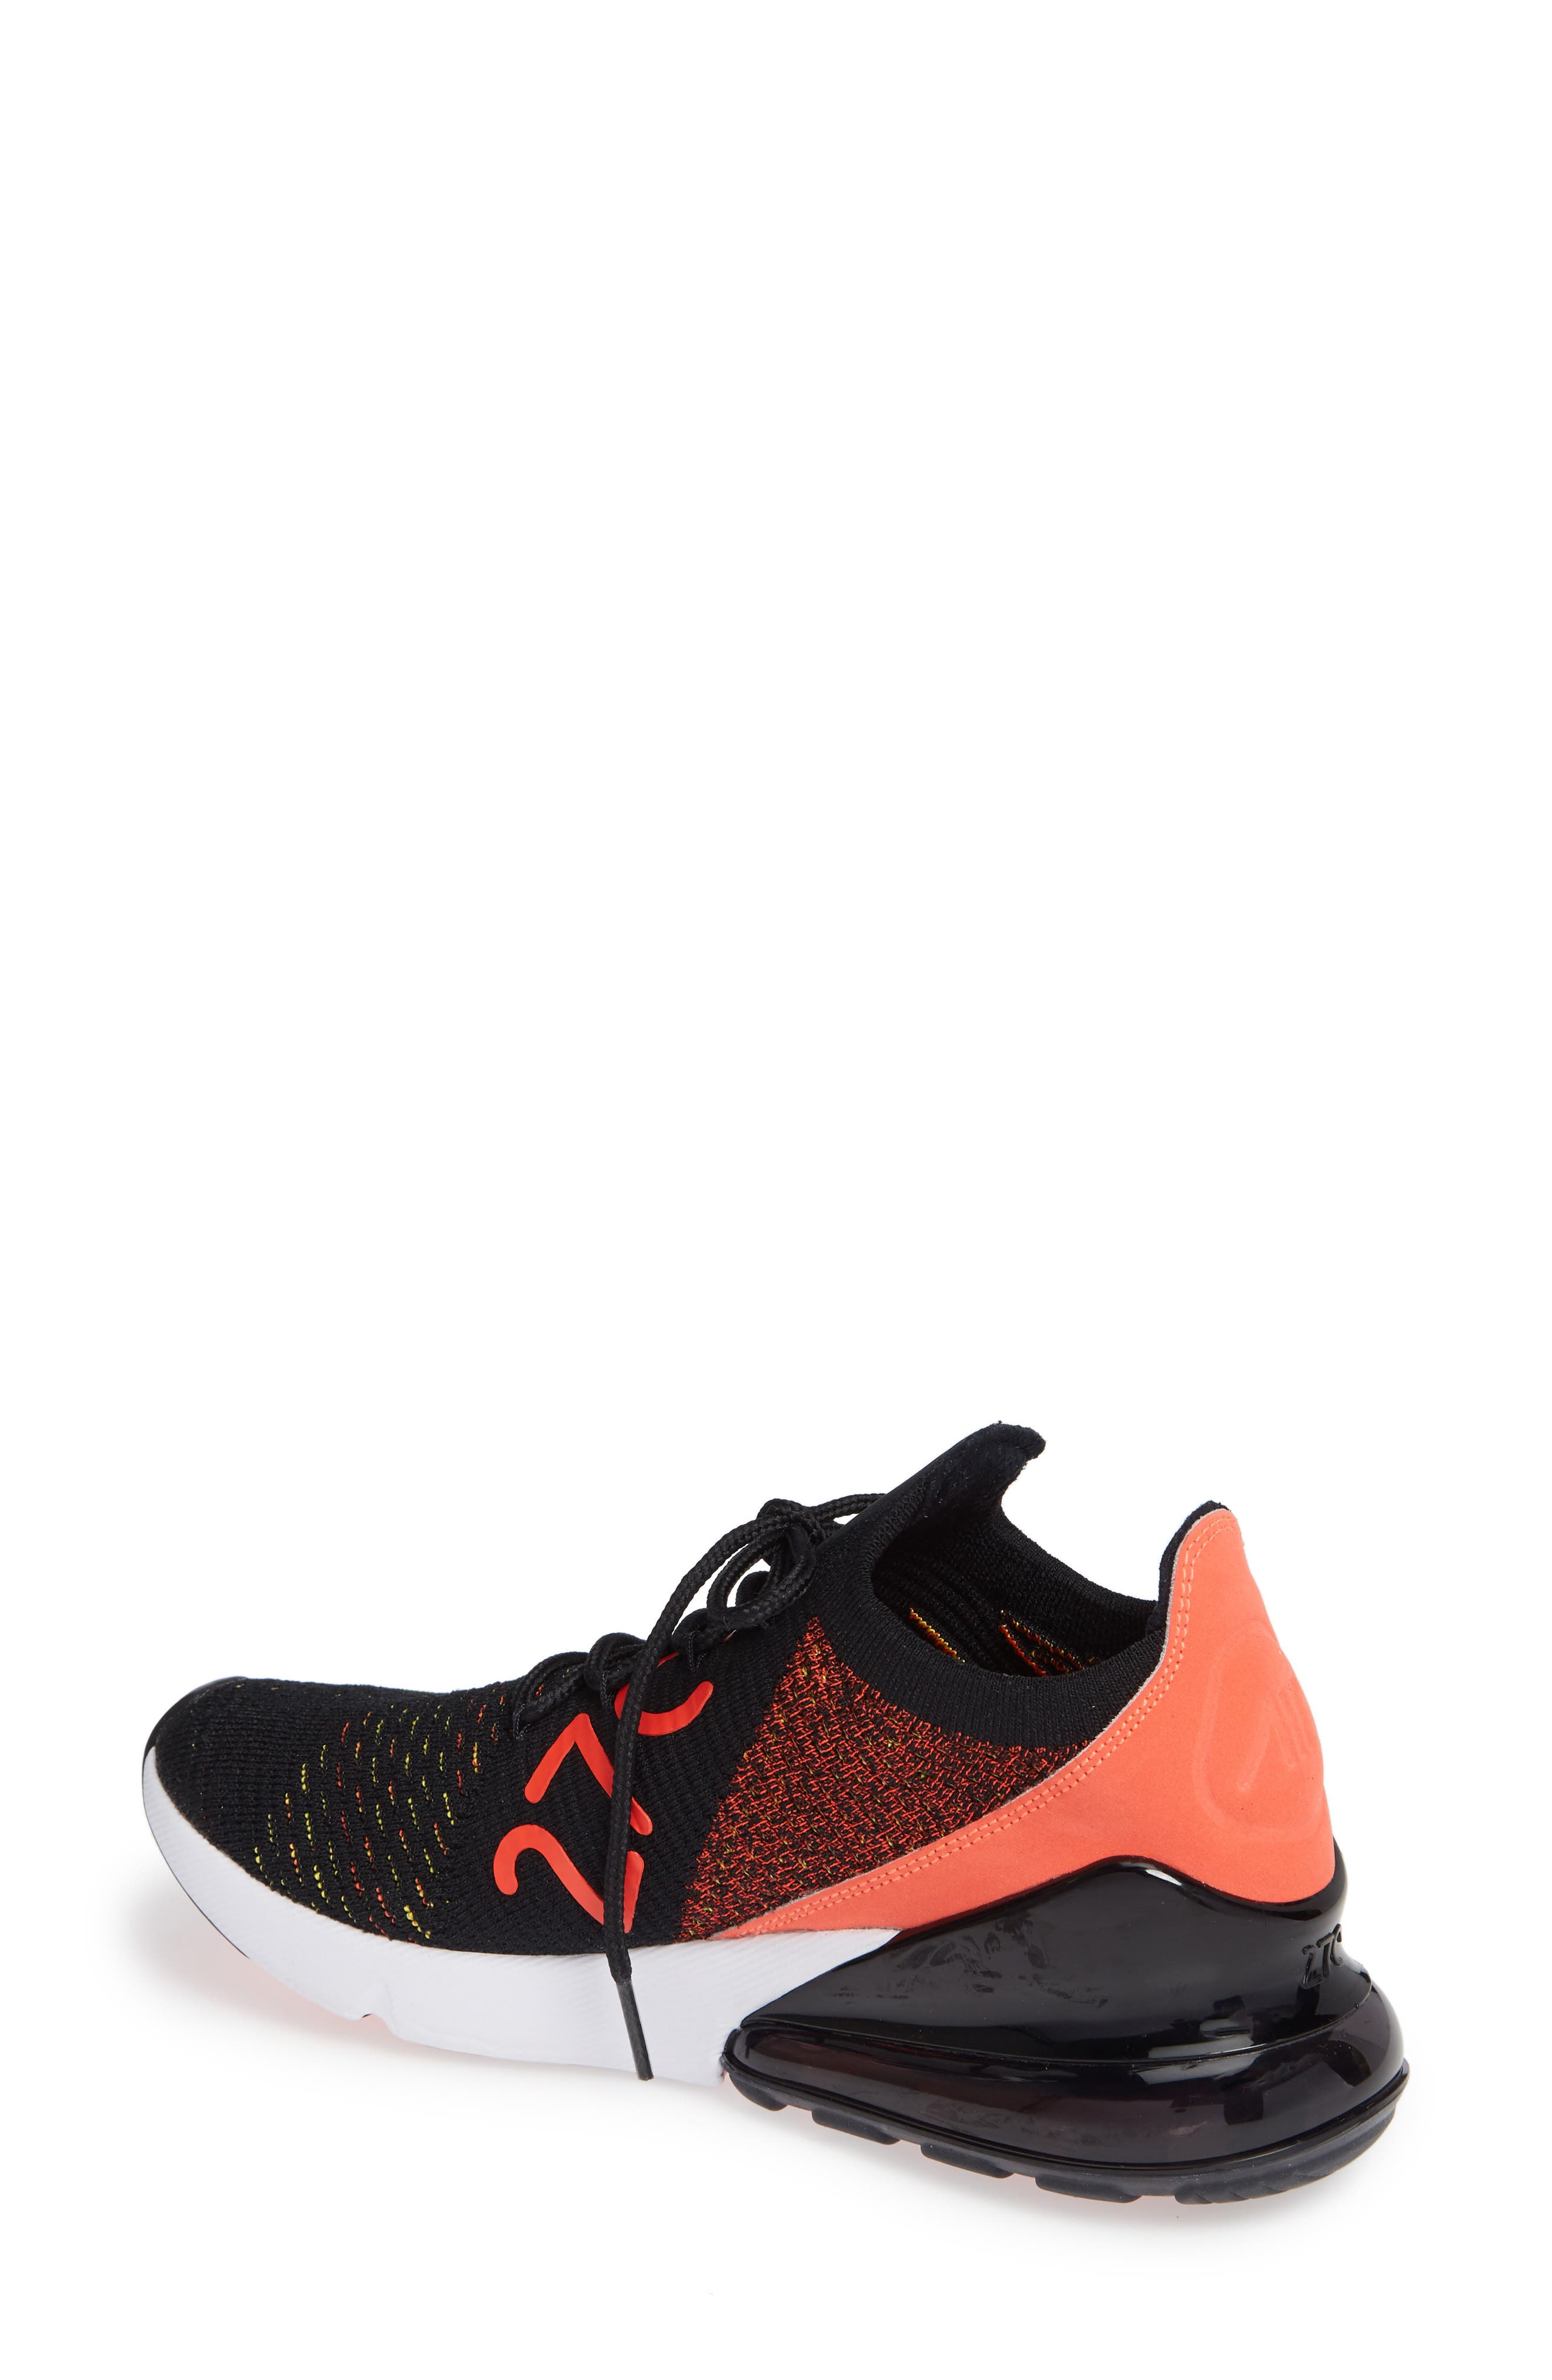 Air Max 270 Flyknit Sneaker,                             Alternate thumbnail 11, color,